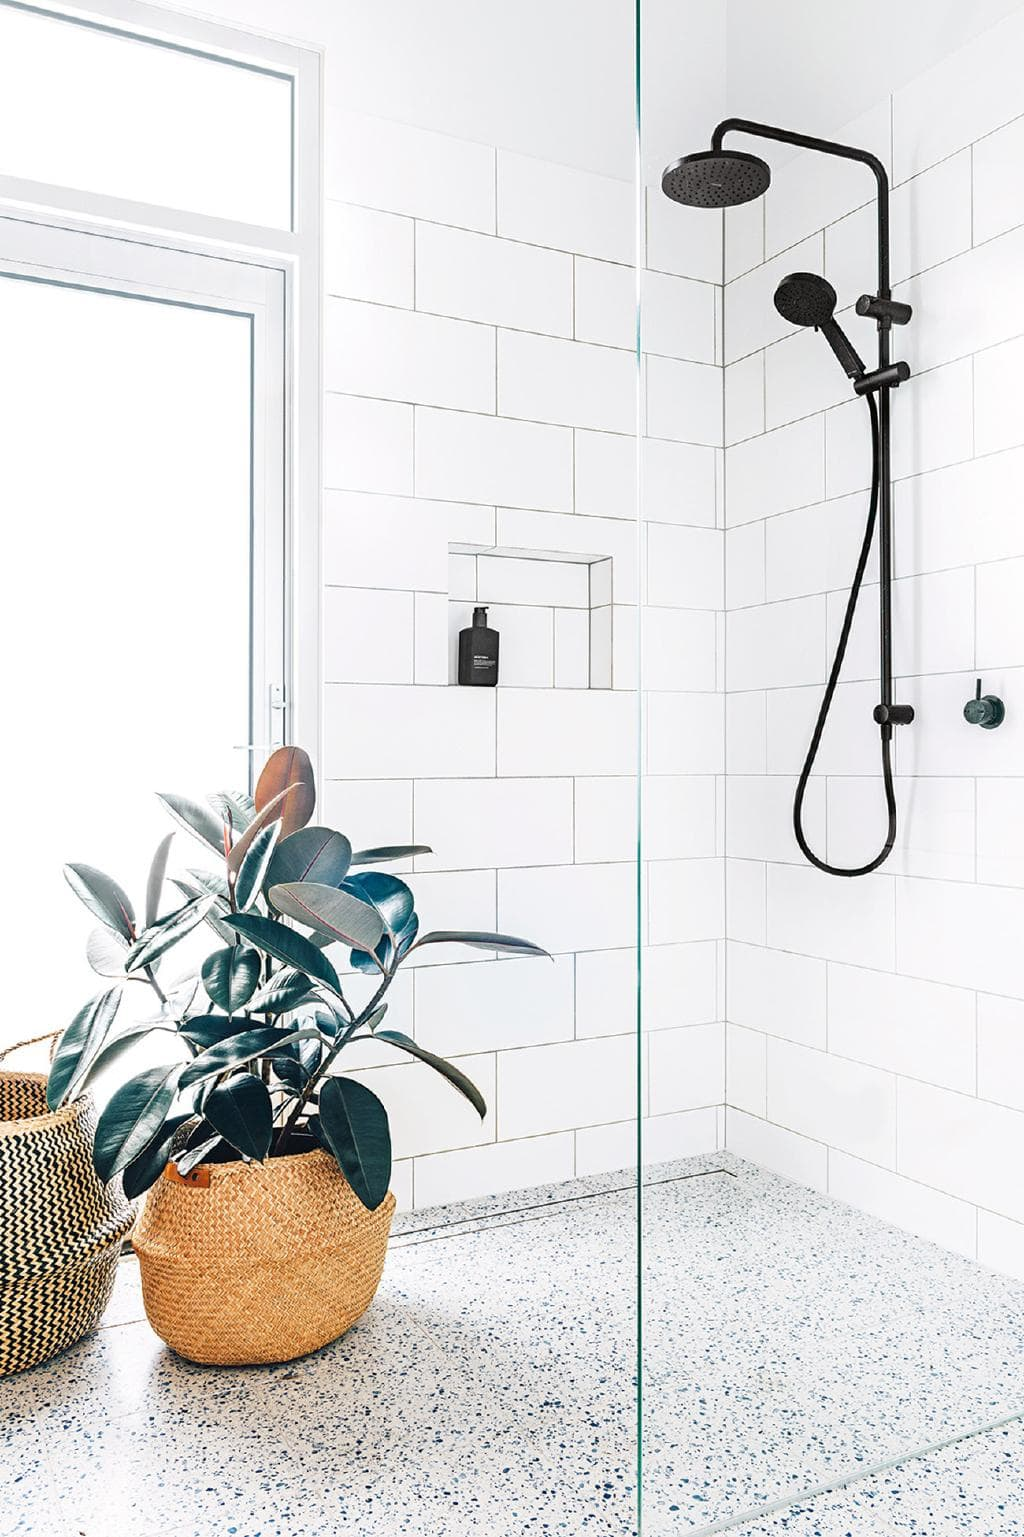 floor and plant bathroom.jpeg